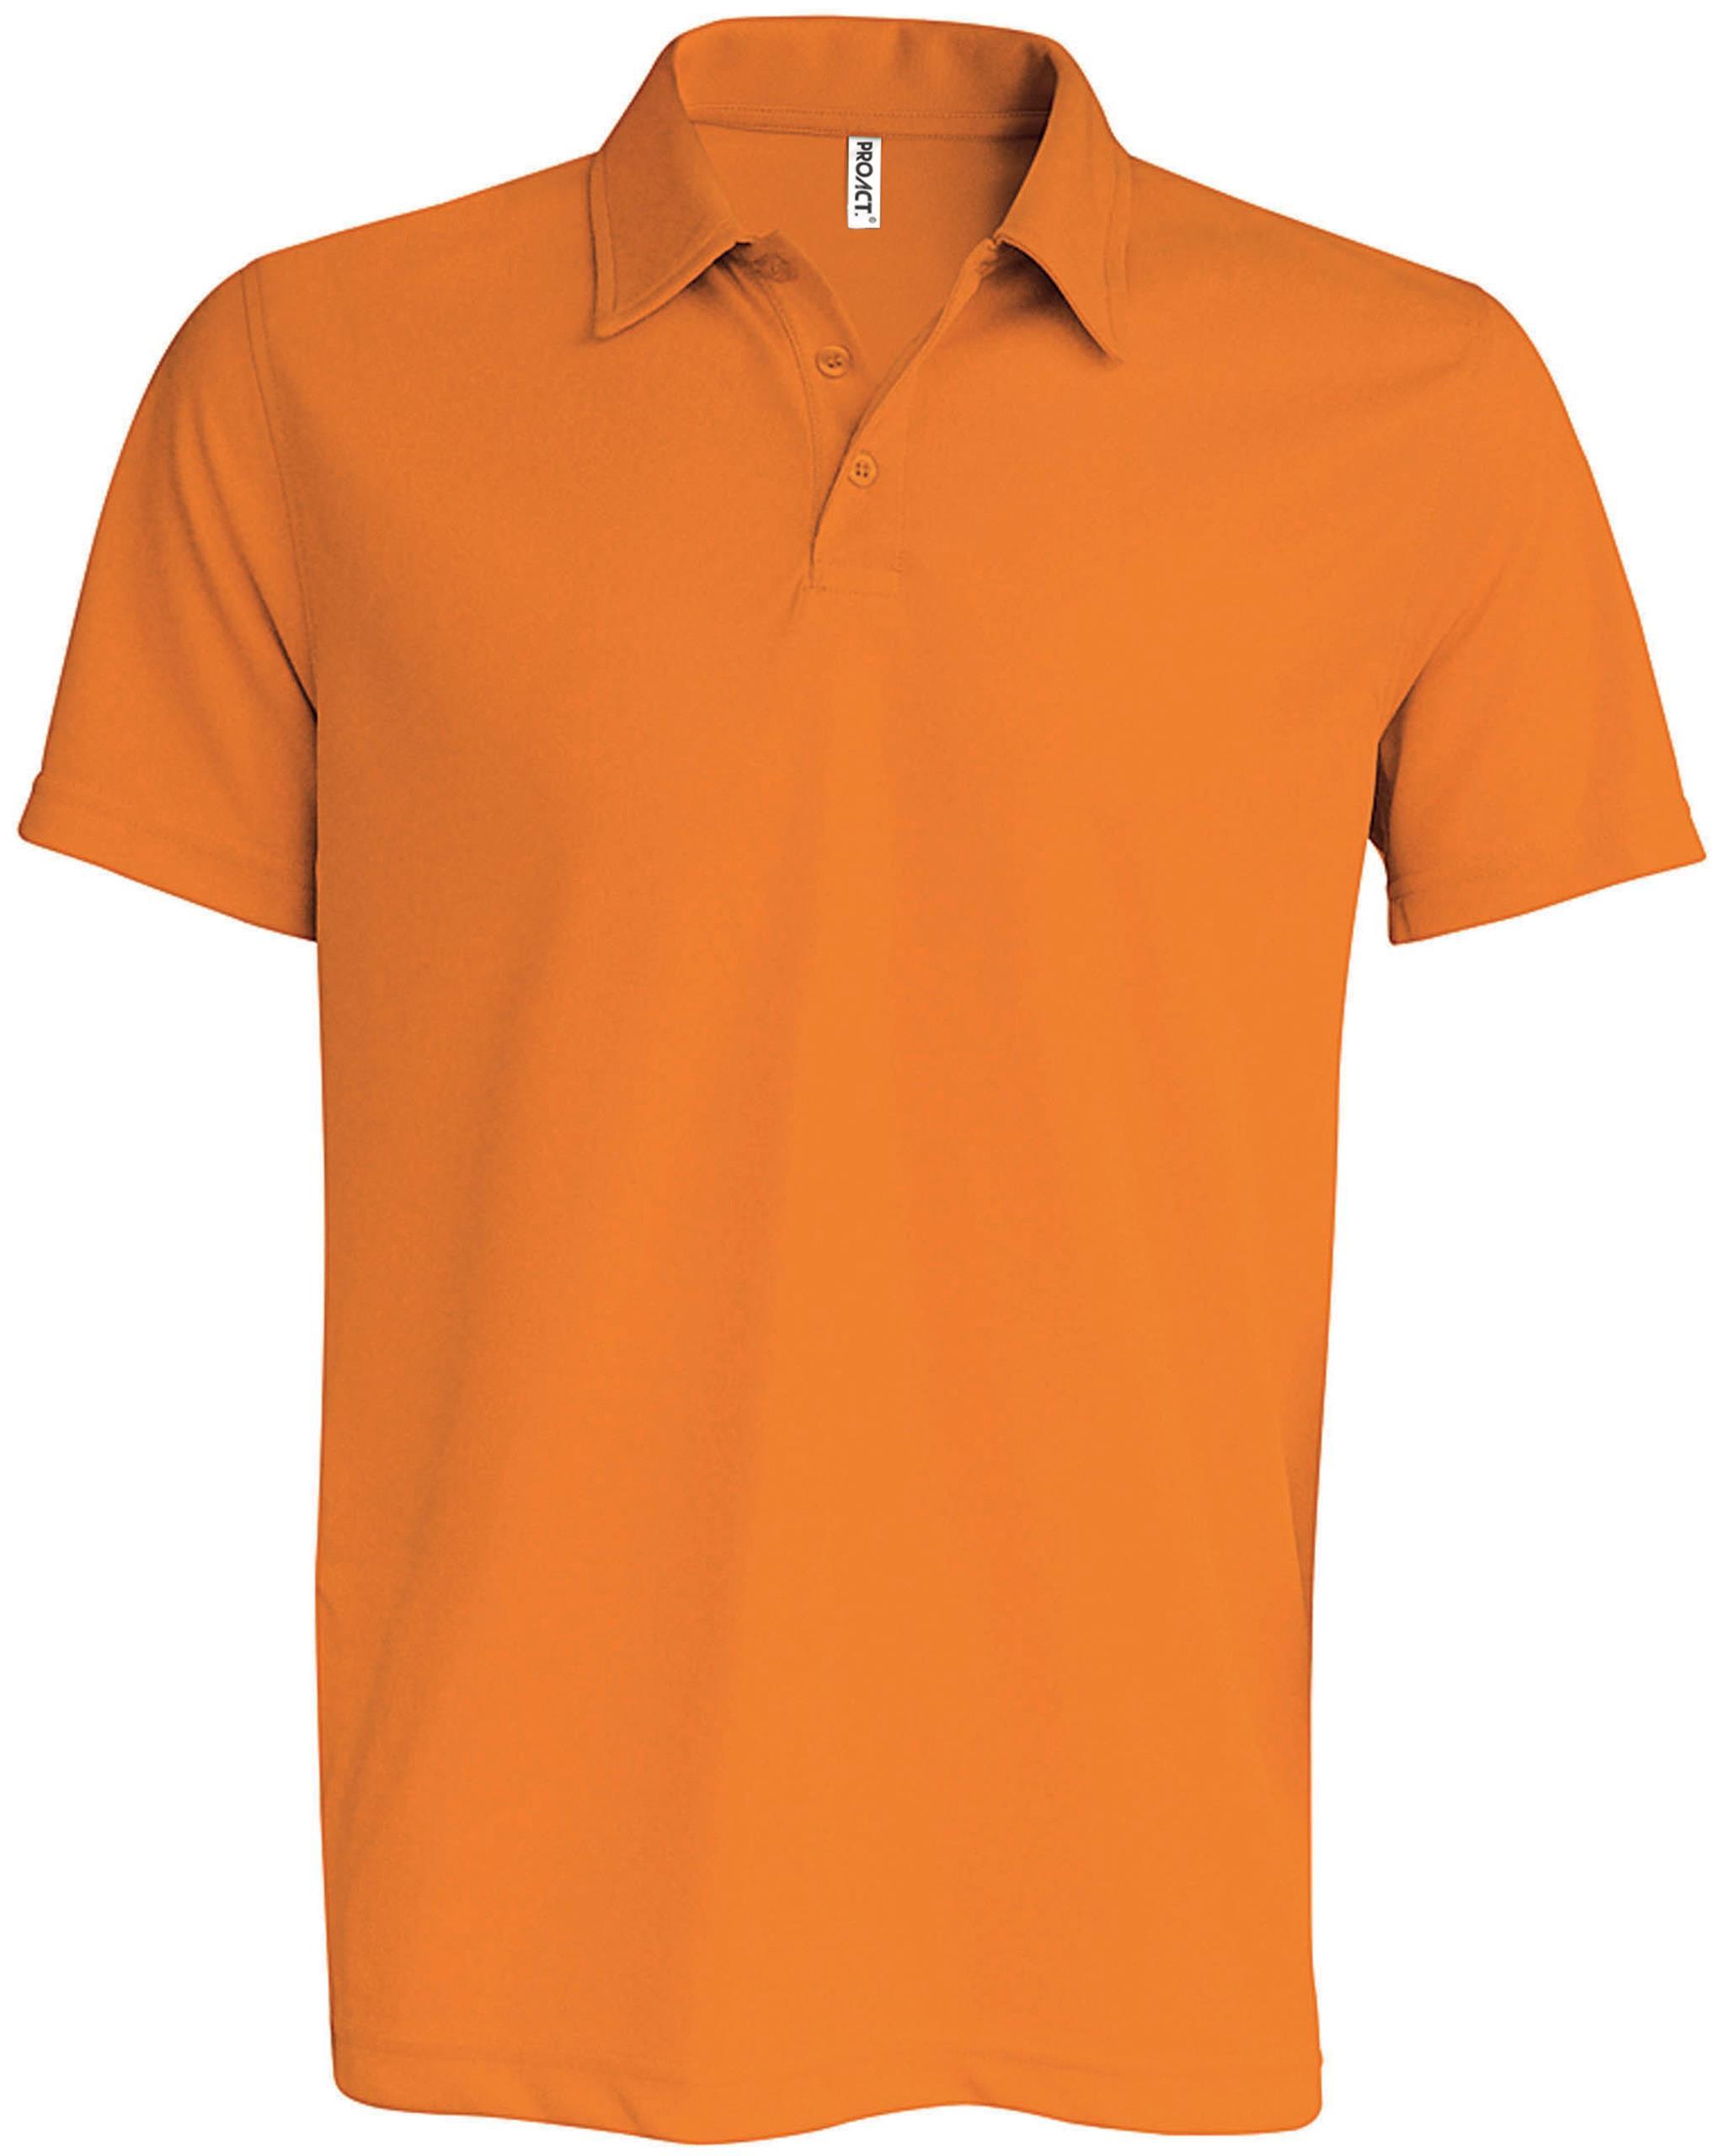 New mens kariban proact short sleeve collared performance for Xxl mens polo shirts